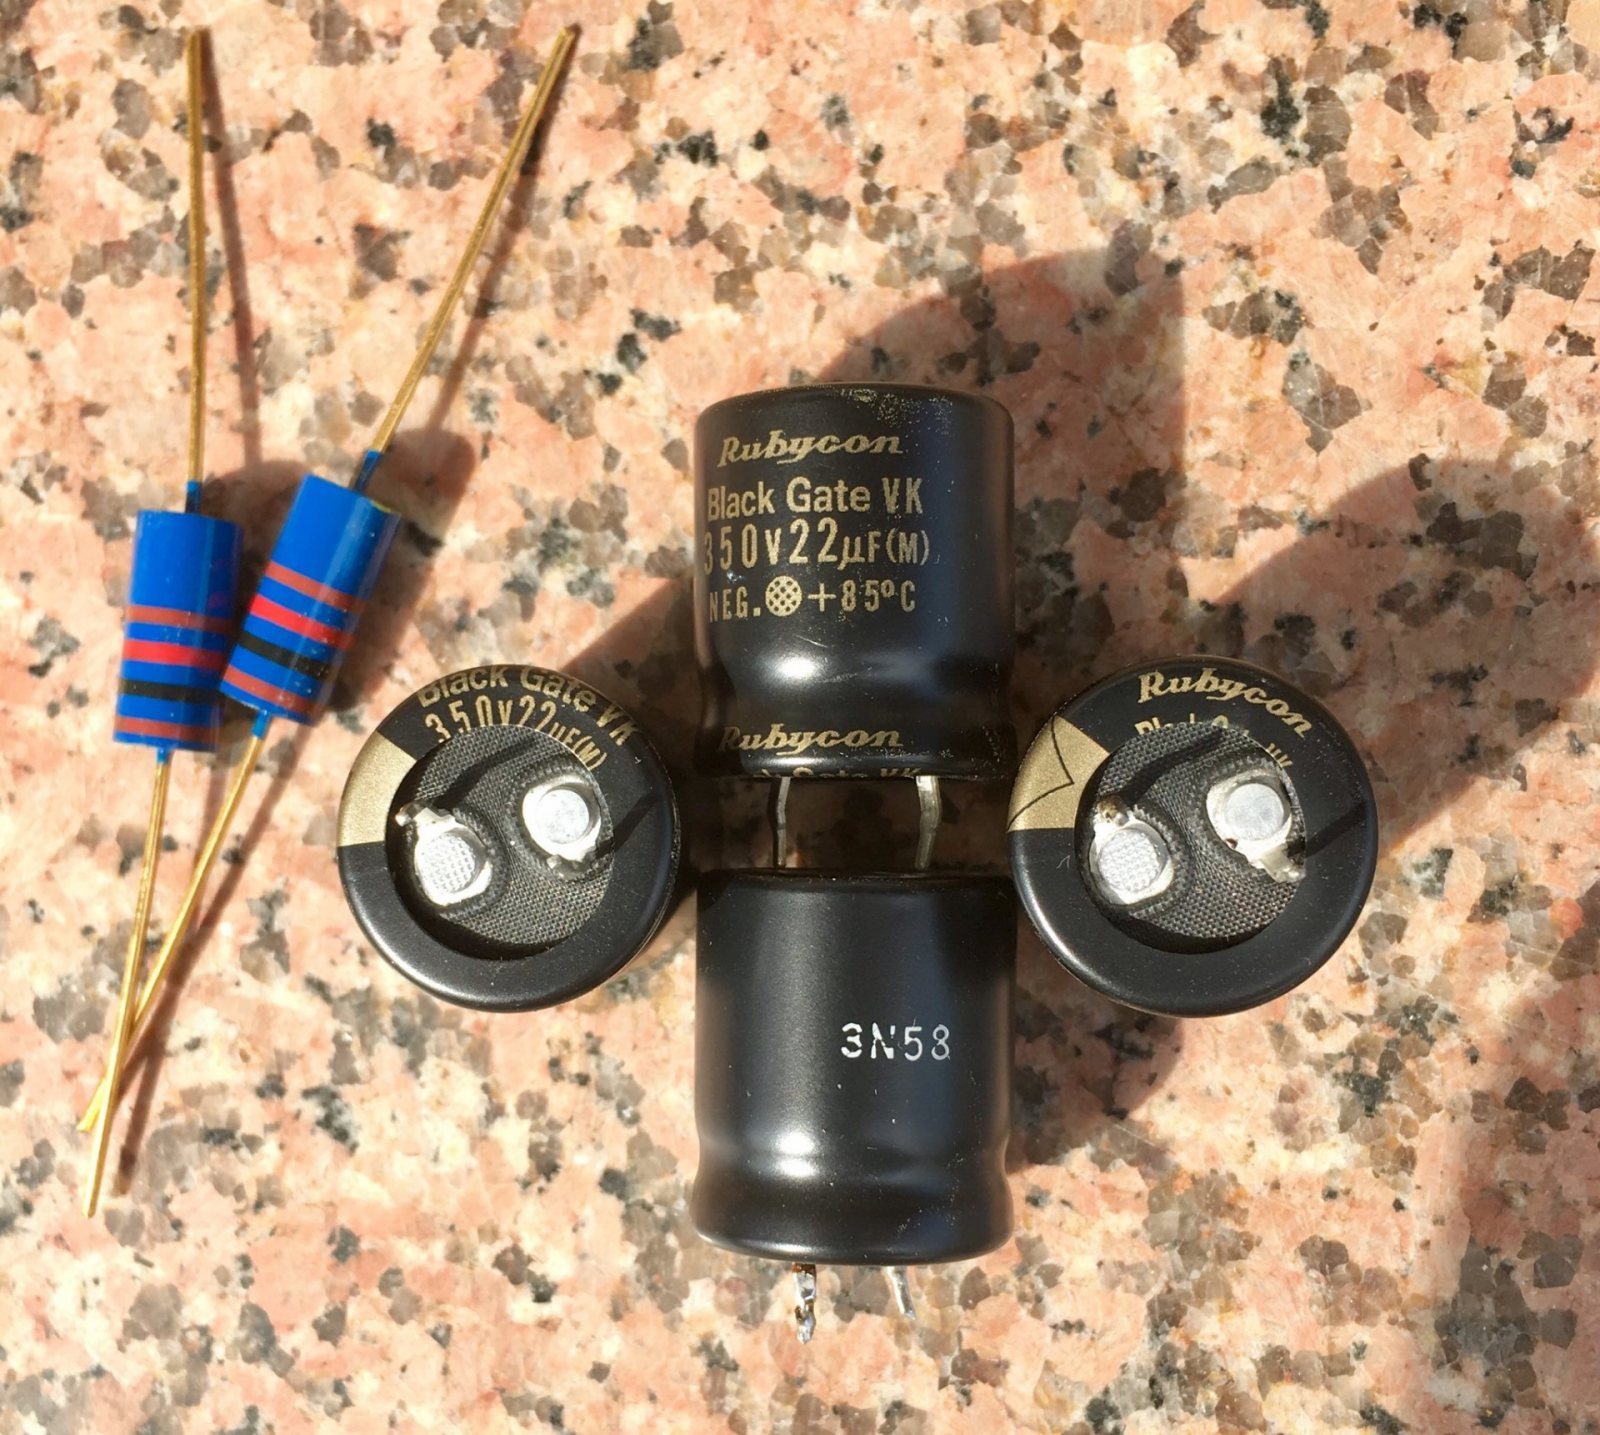 9C1DBE76-E133-4BCF-9D37-6001A872DC4D.jpeg